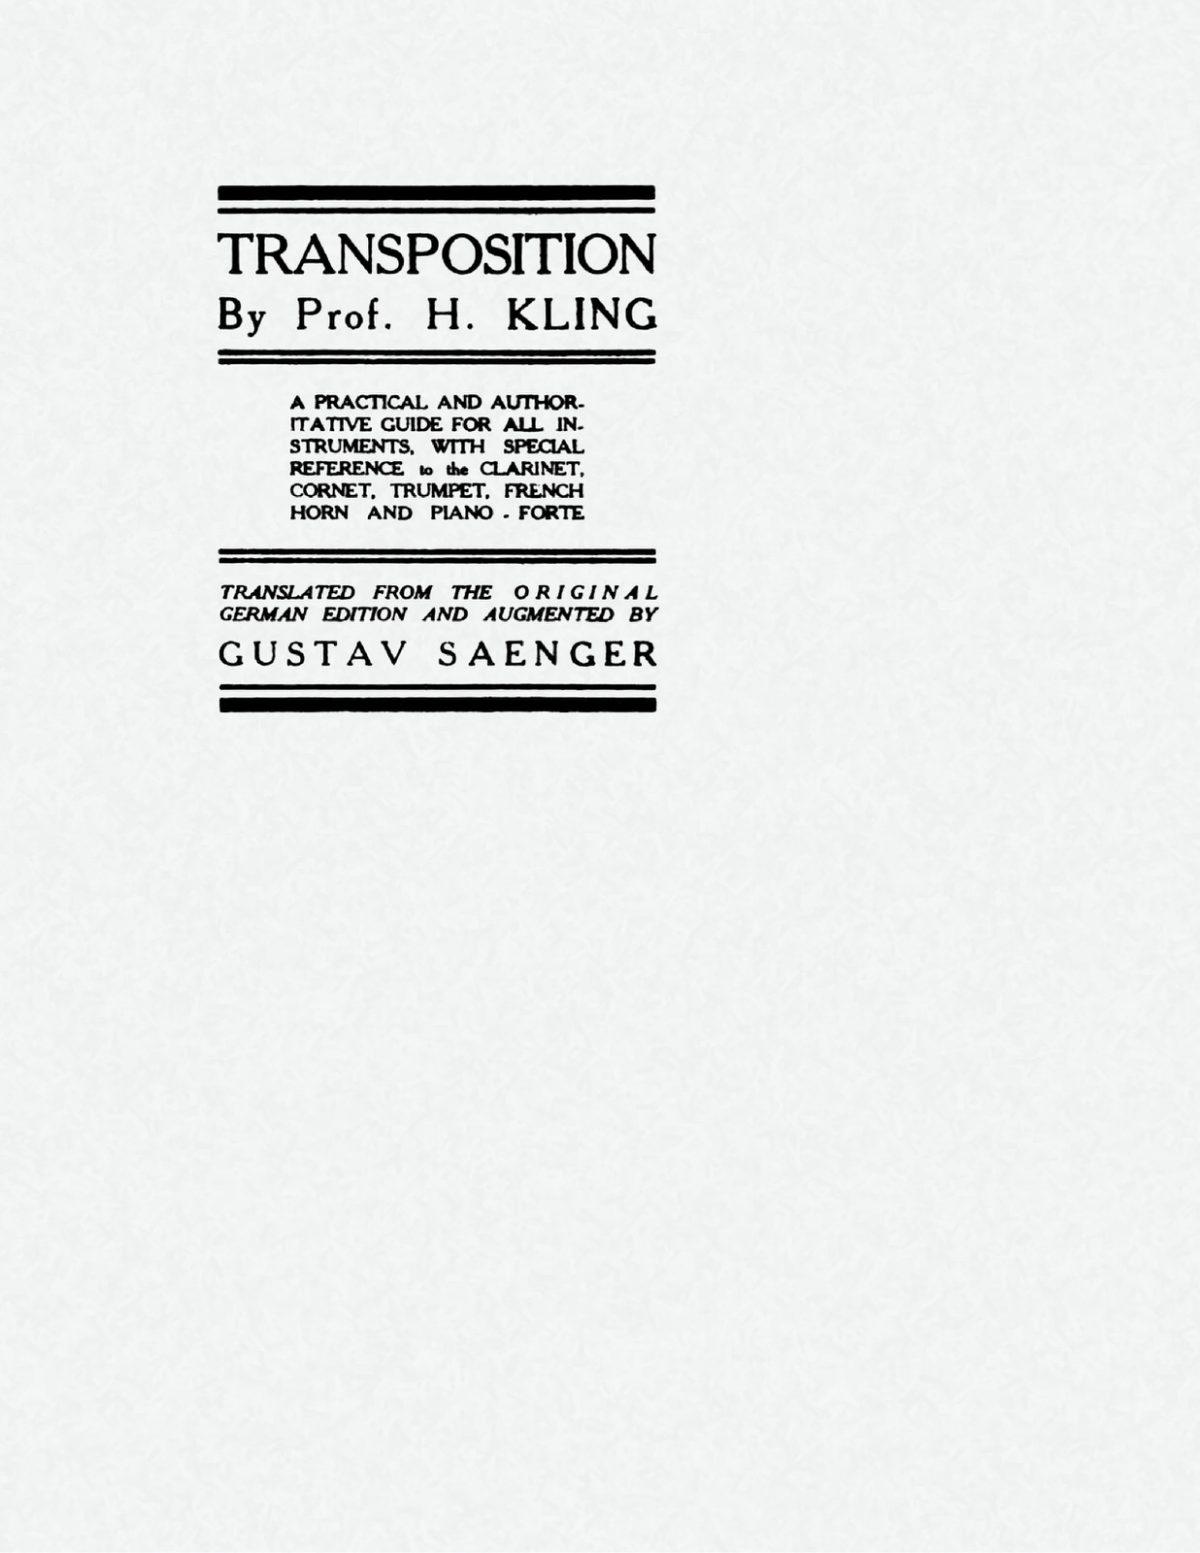 Kling, Transposition